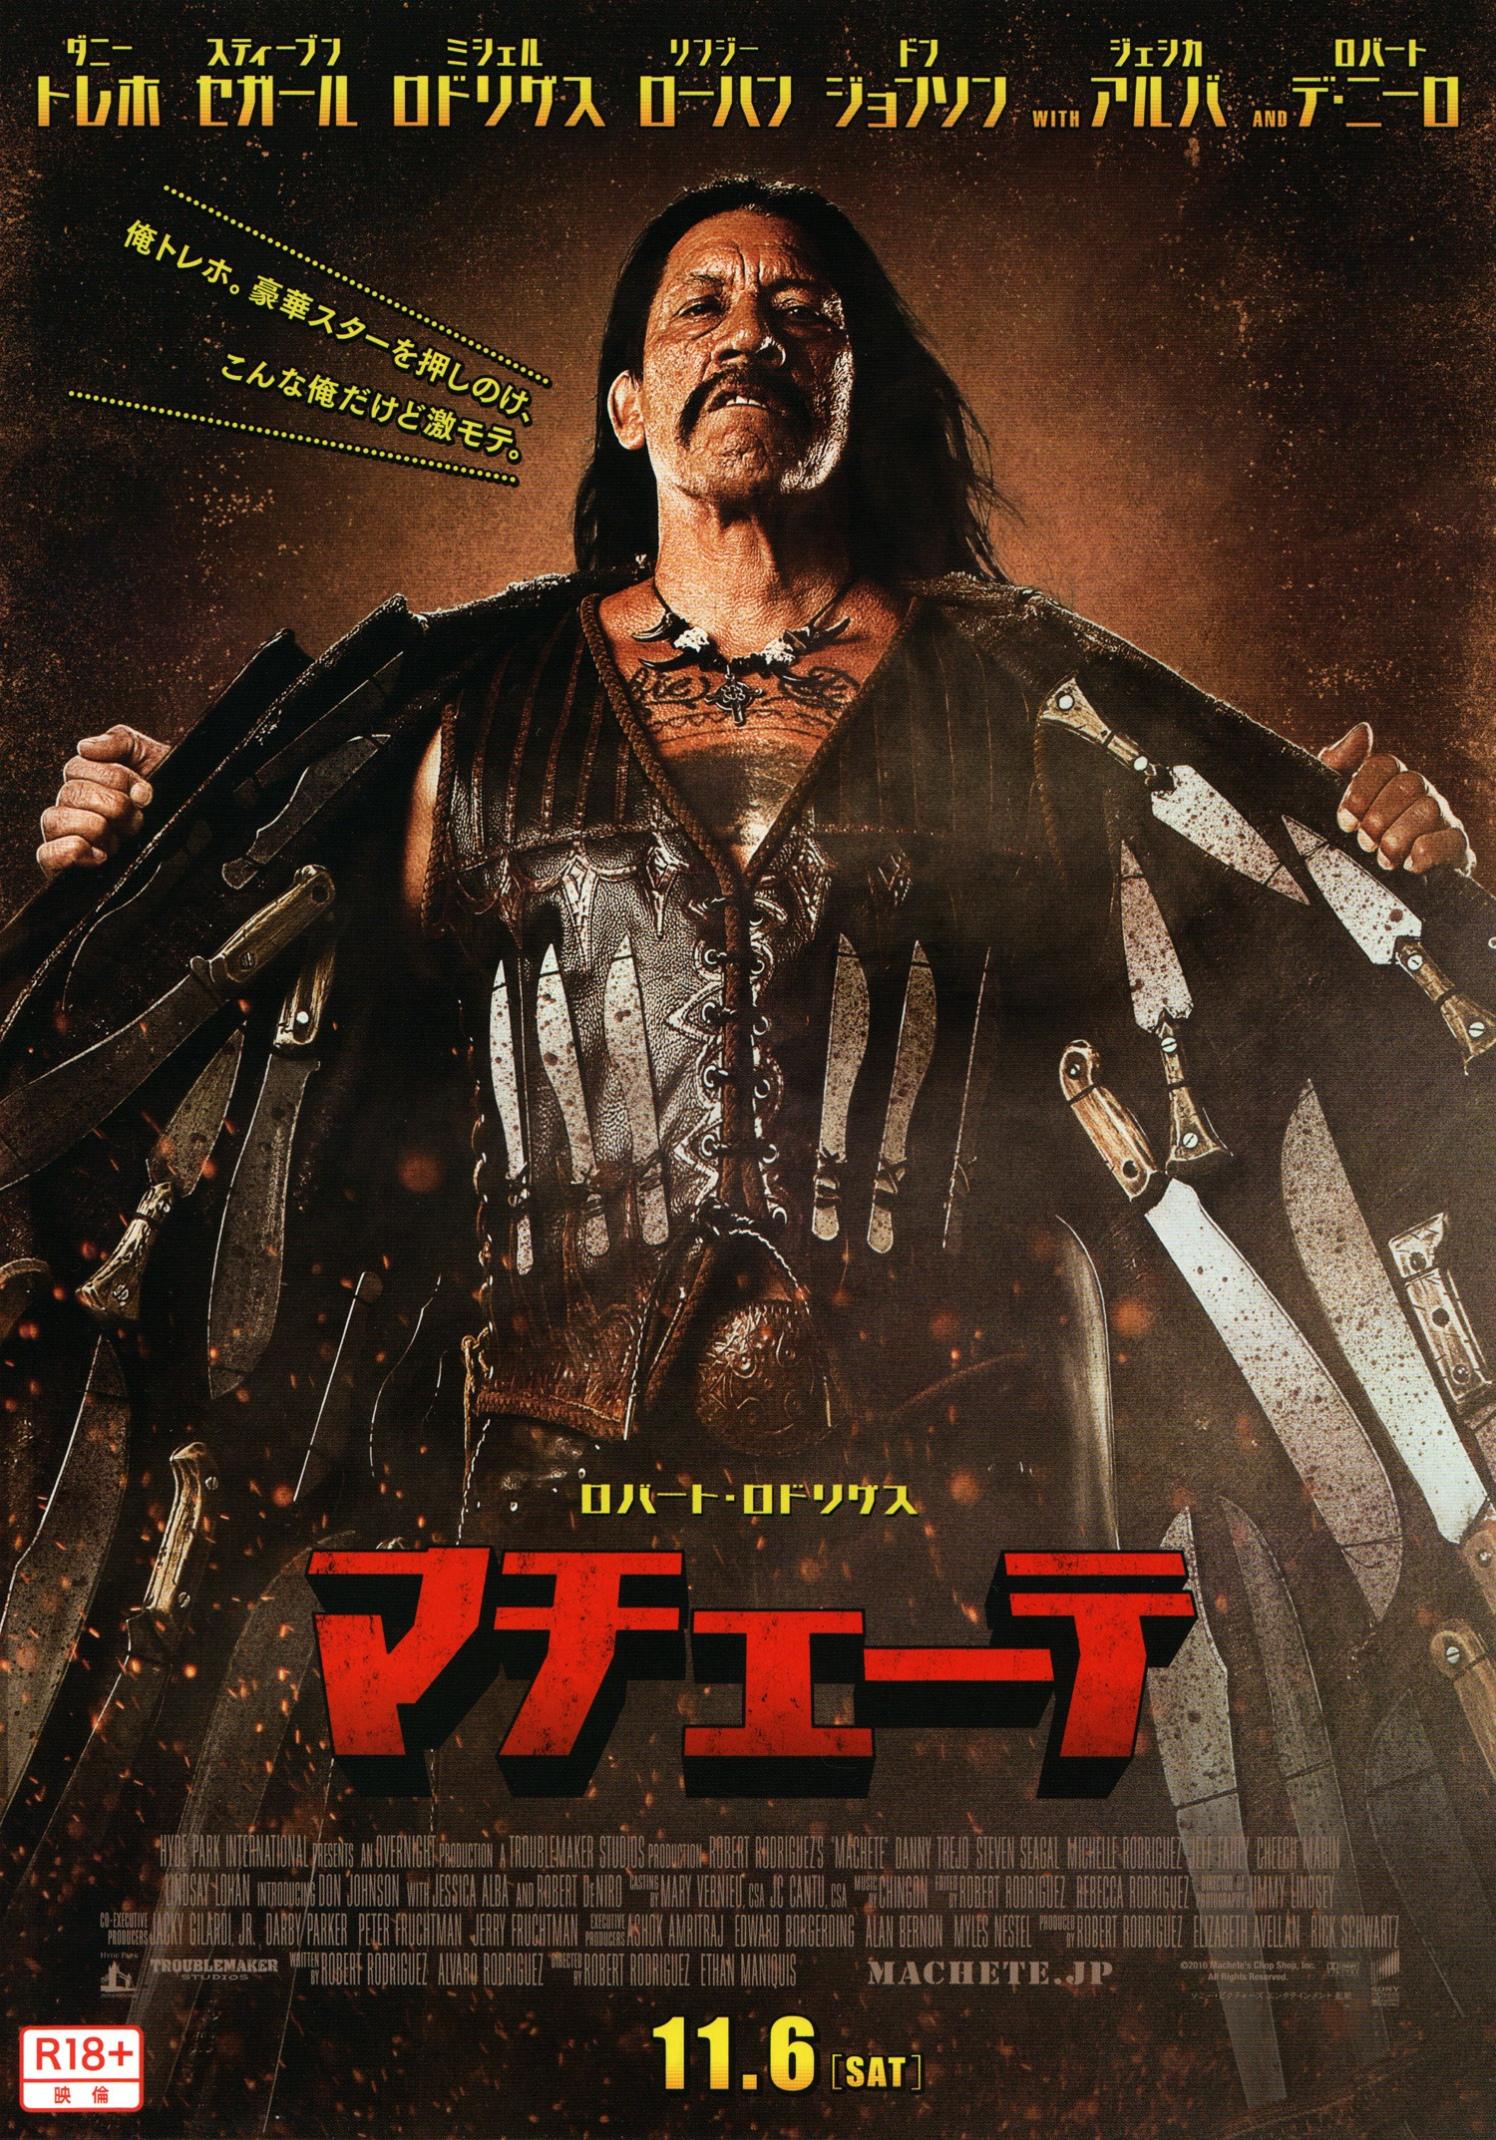 machete-japan-1